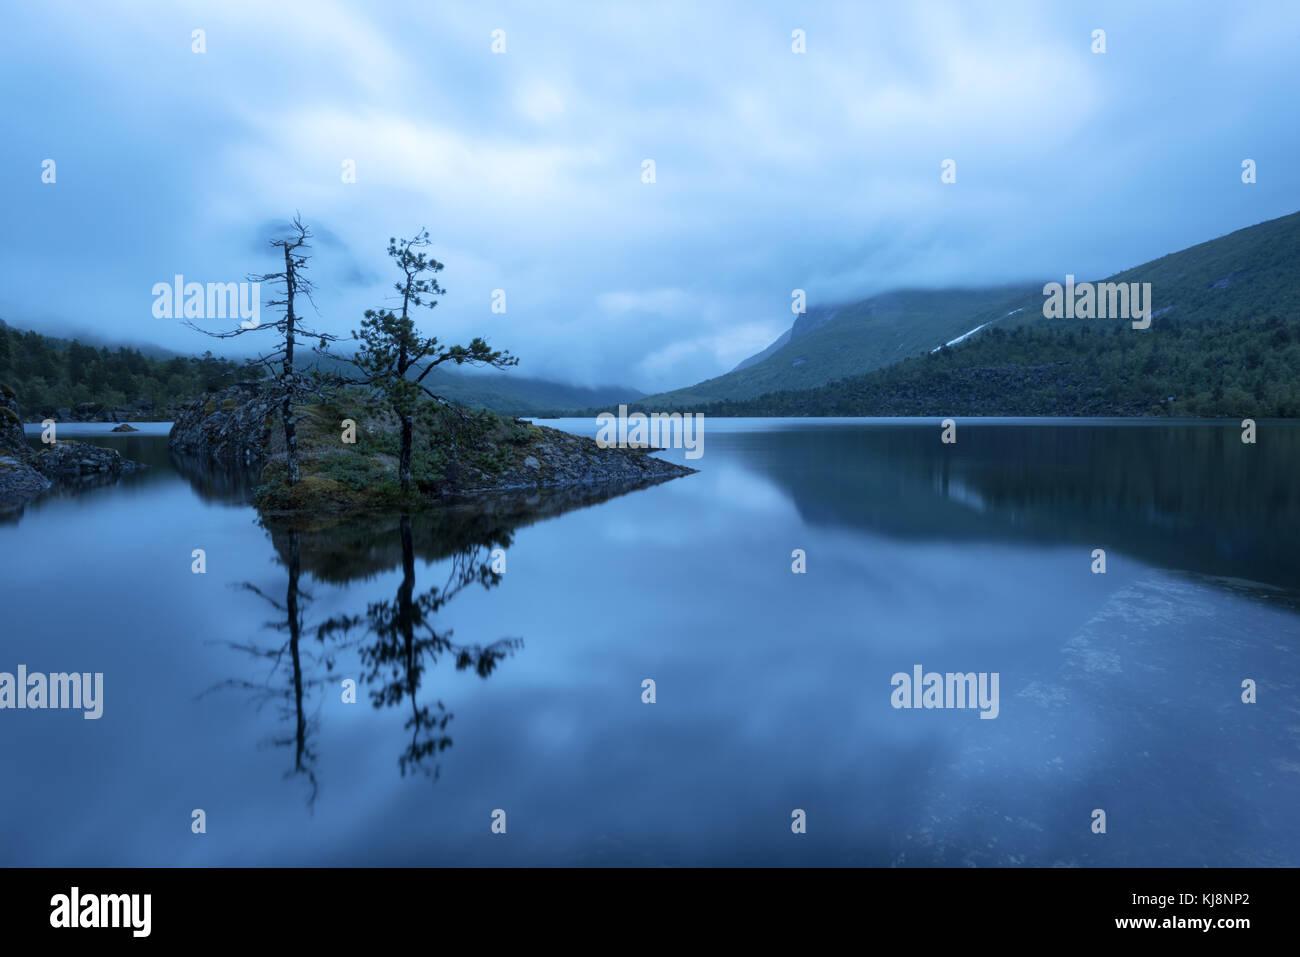 Super abend Landschaft auf innerdalsvatna See Stockbild